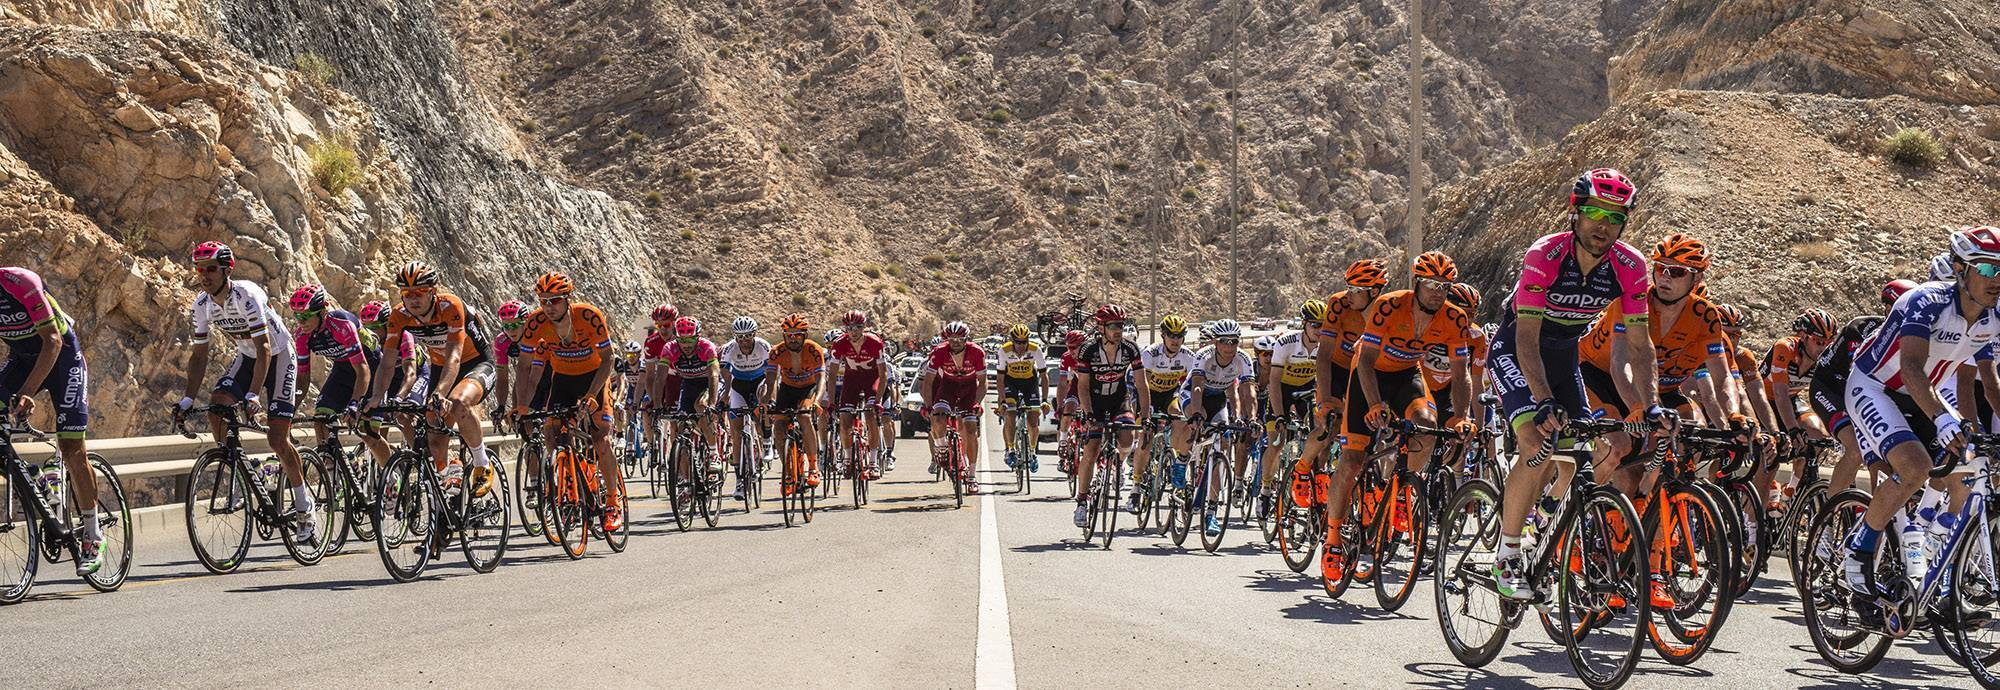 Header: WANTY - GOBERT CYCLING TEAM